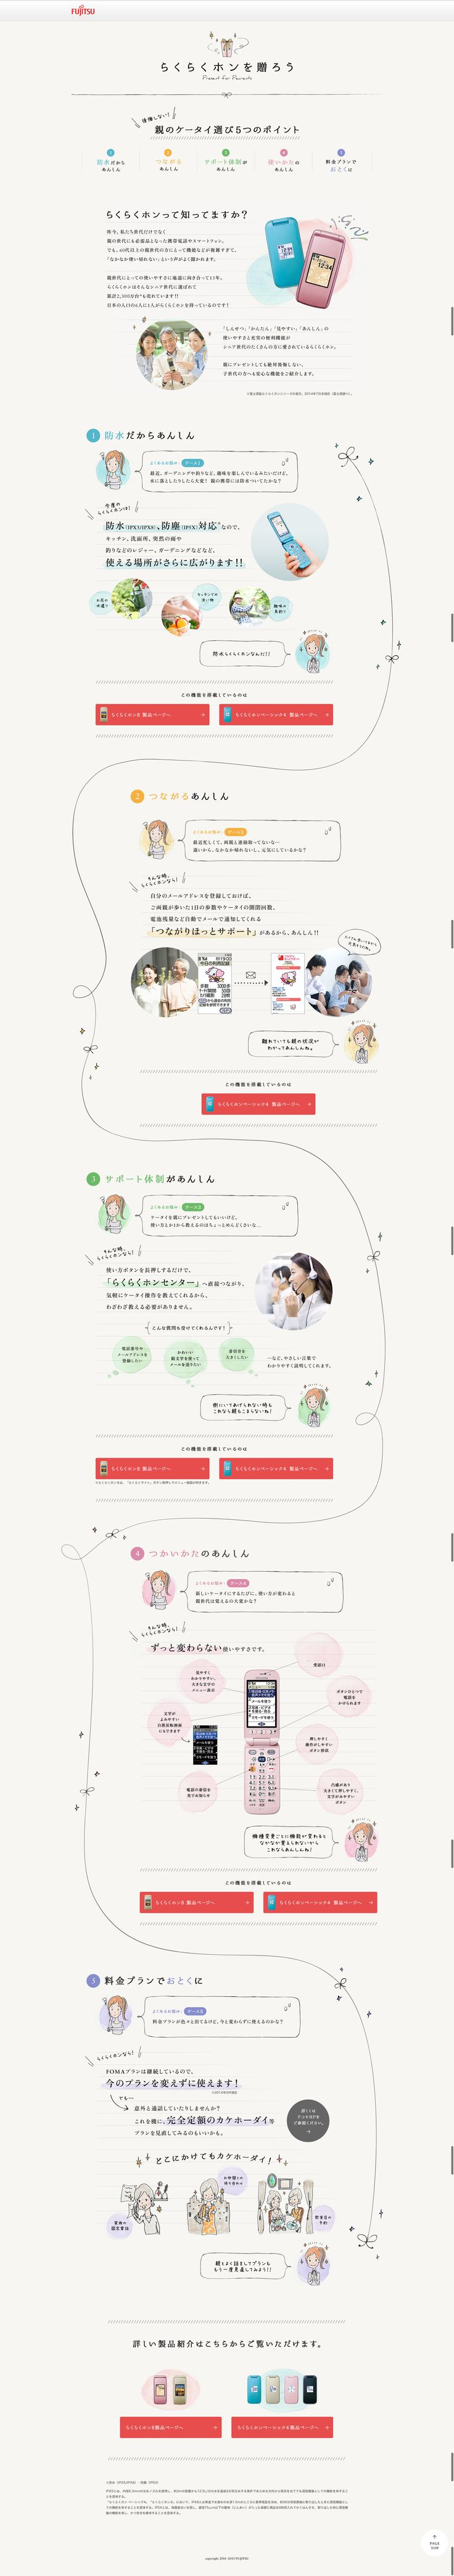 http://atfe.fmworld.net/at/rakuraku_special/?fmwfrom=f-01g_text_pc1003